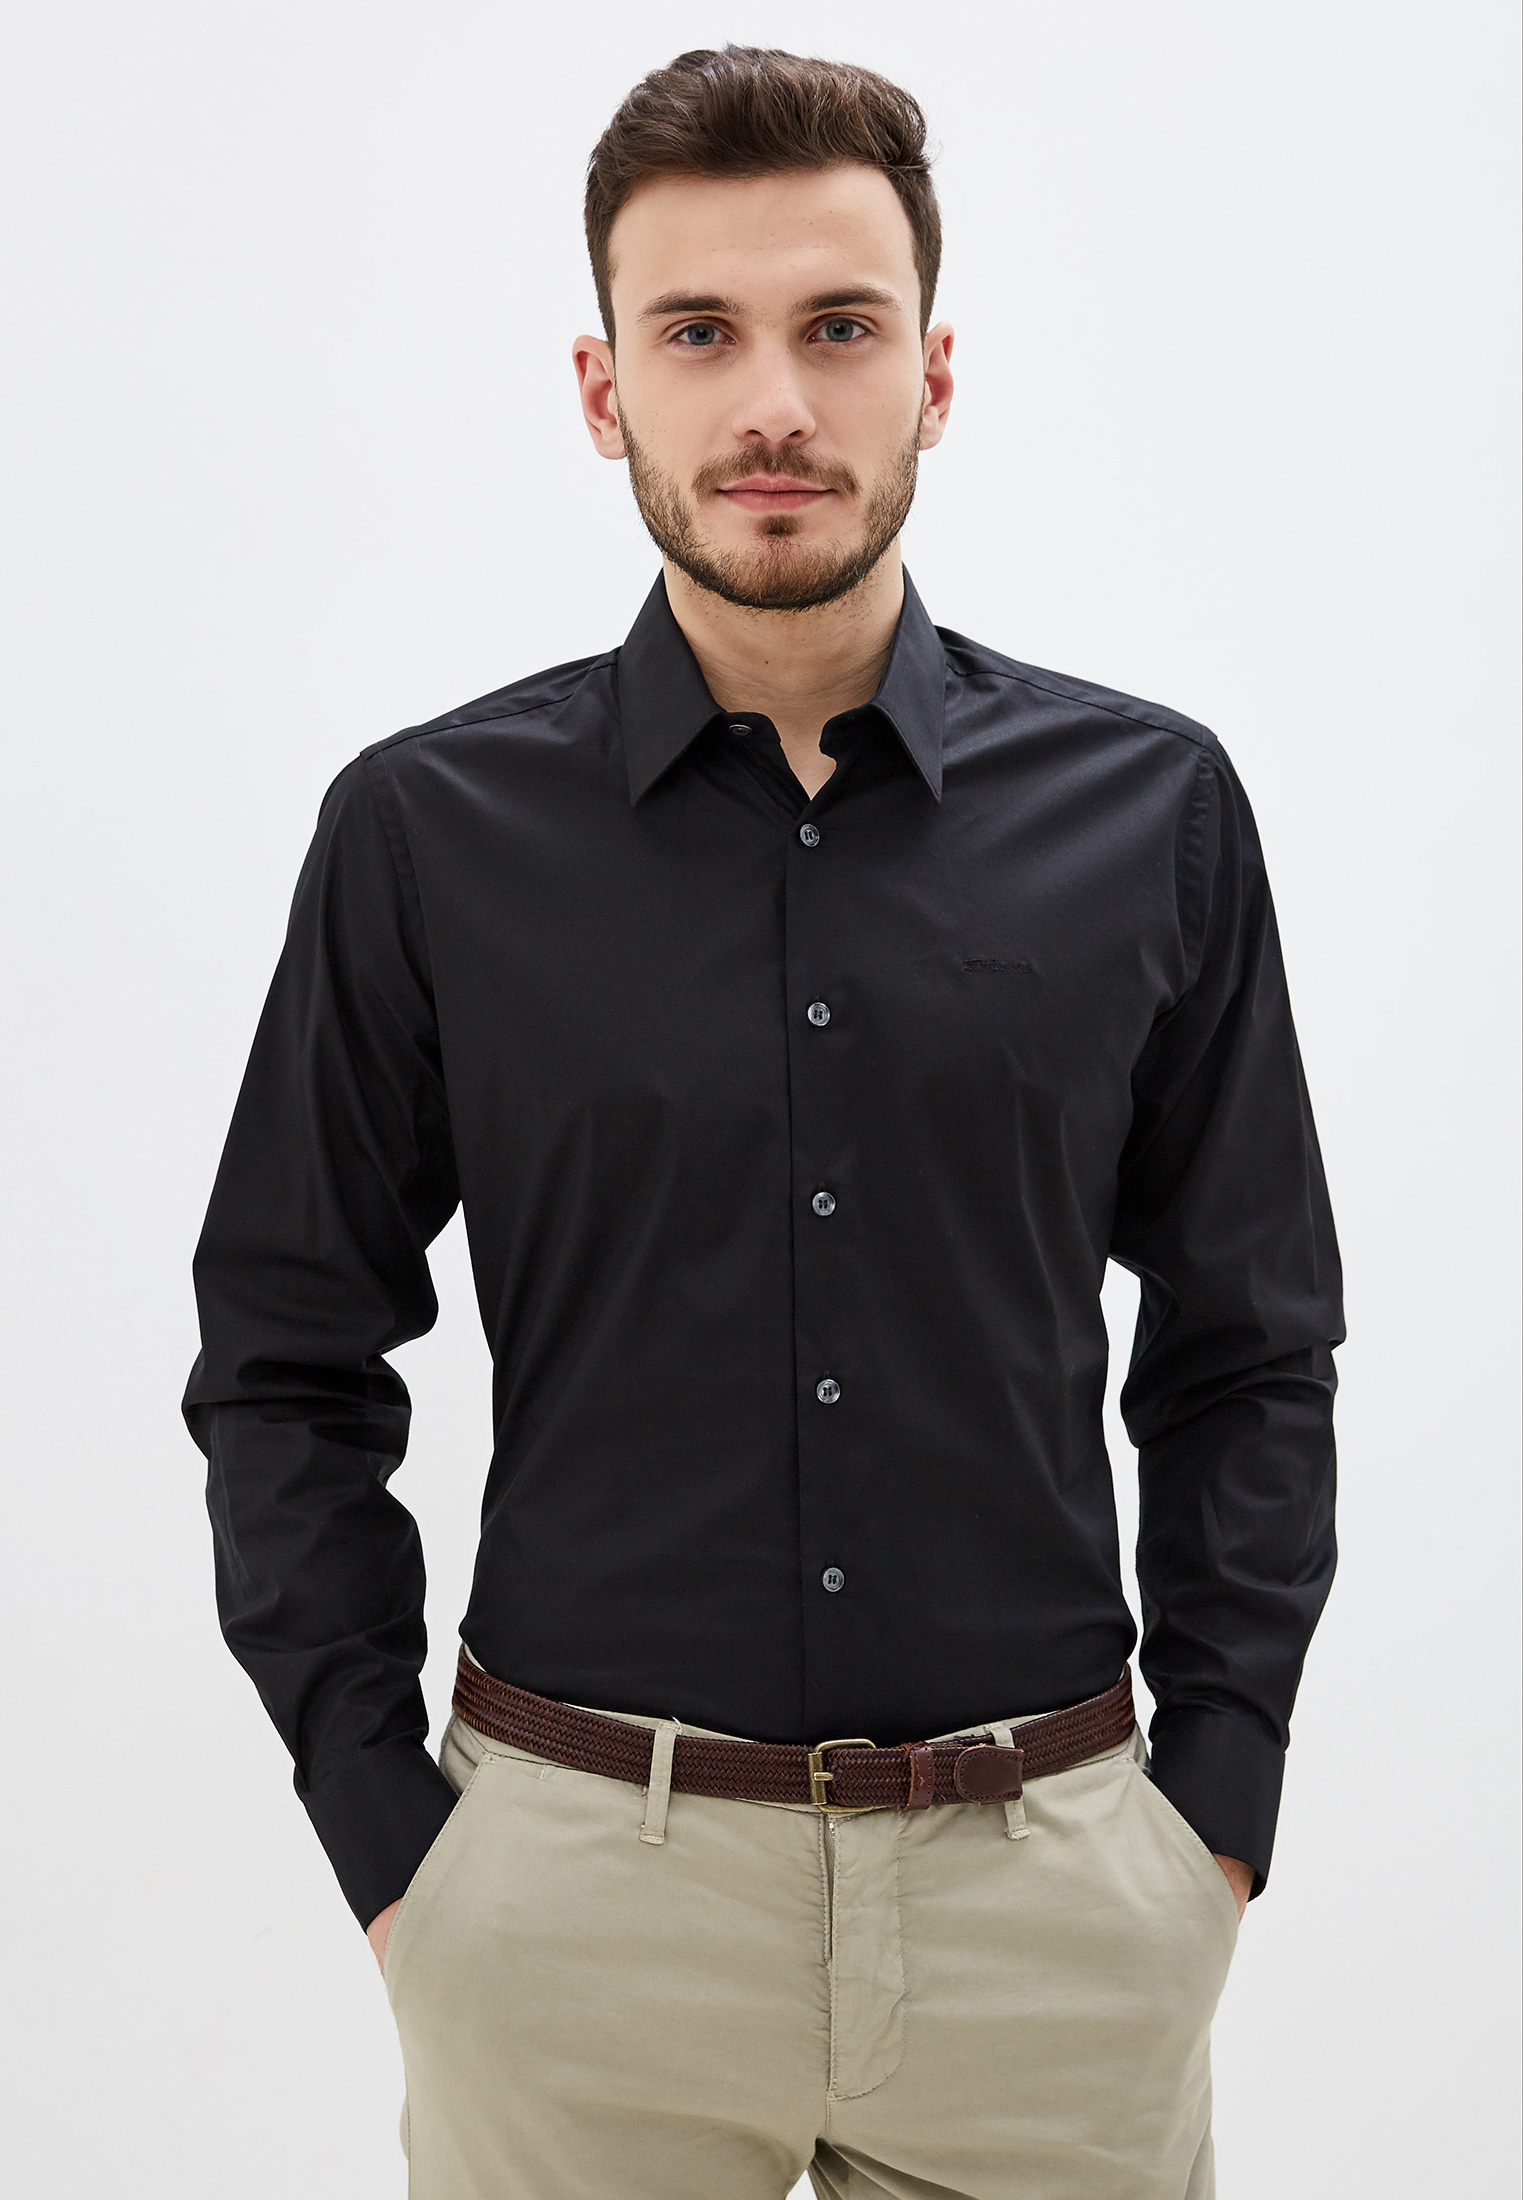 Рубашка с длинным рукавом Just Cavalli (Джаст Кавалли) S03DL0187